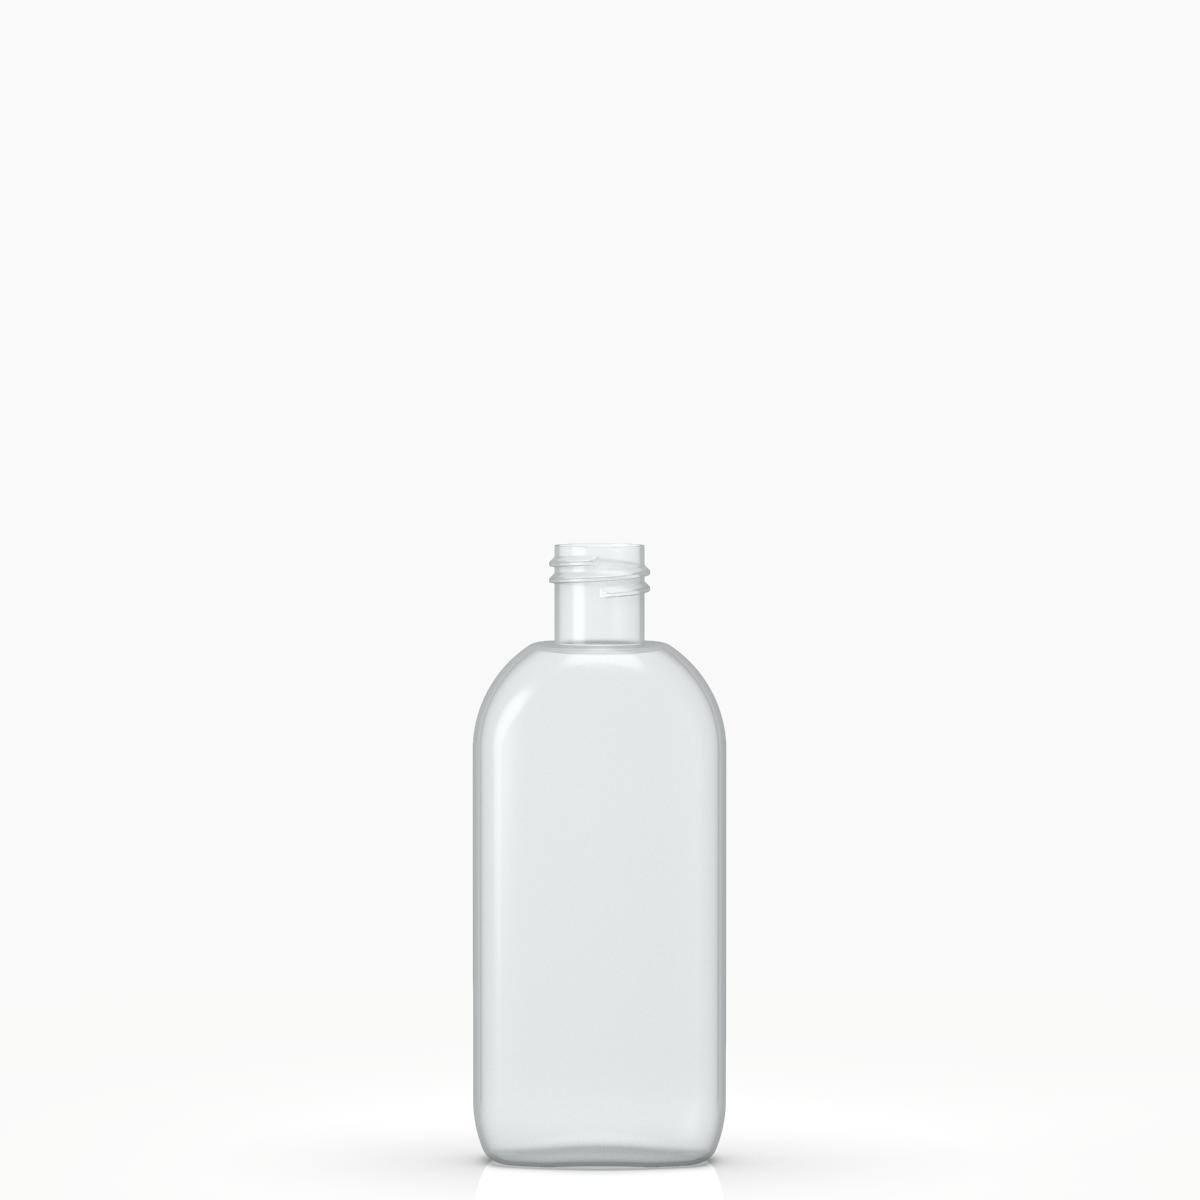 Round bottle 100 ml PVC, neck 20/415, style BERNA